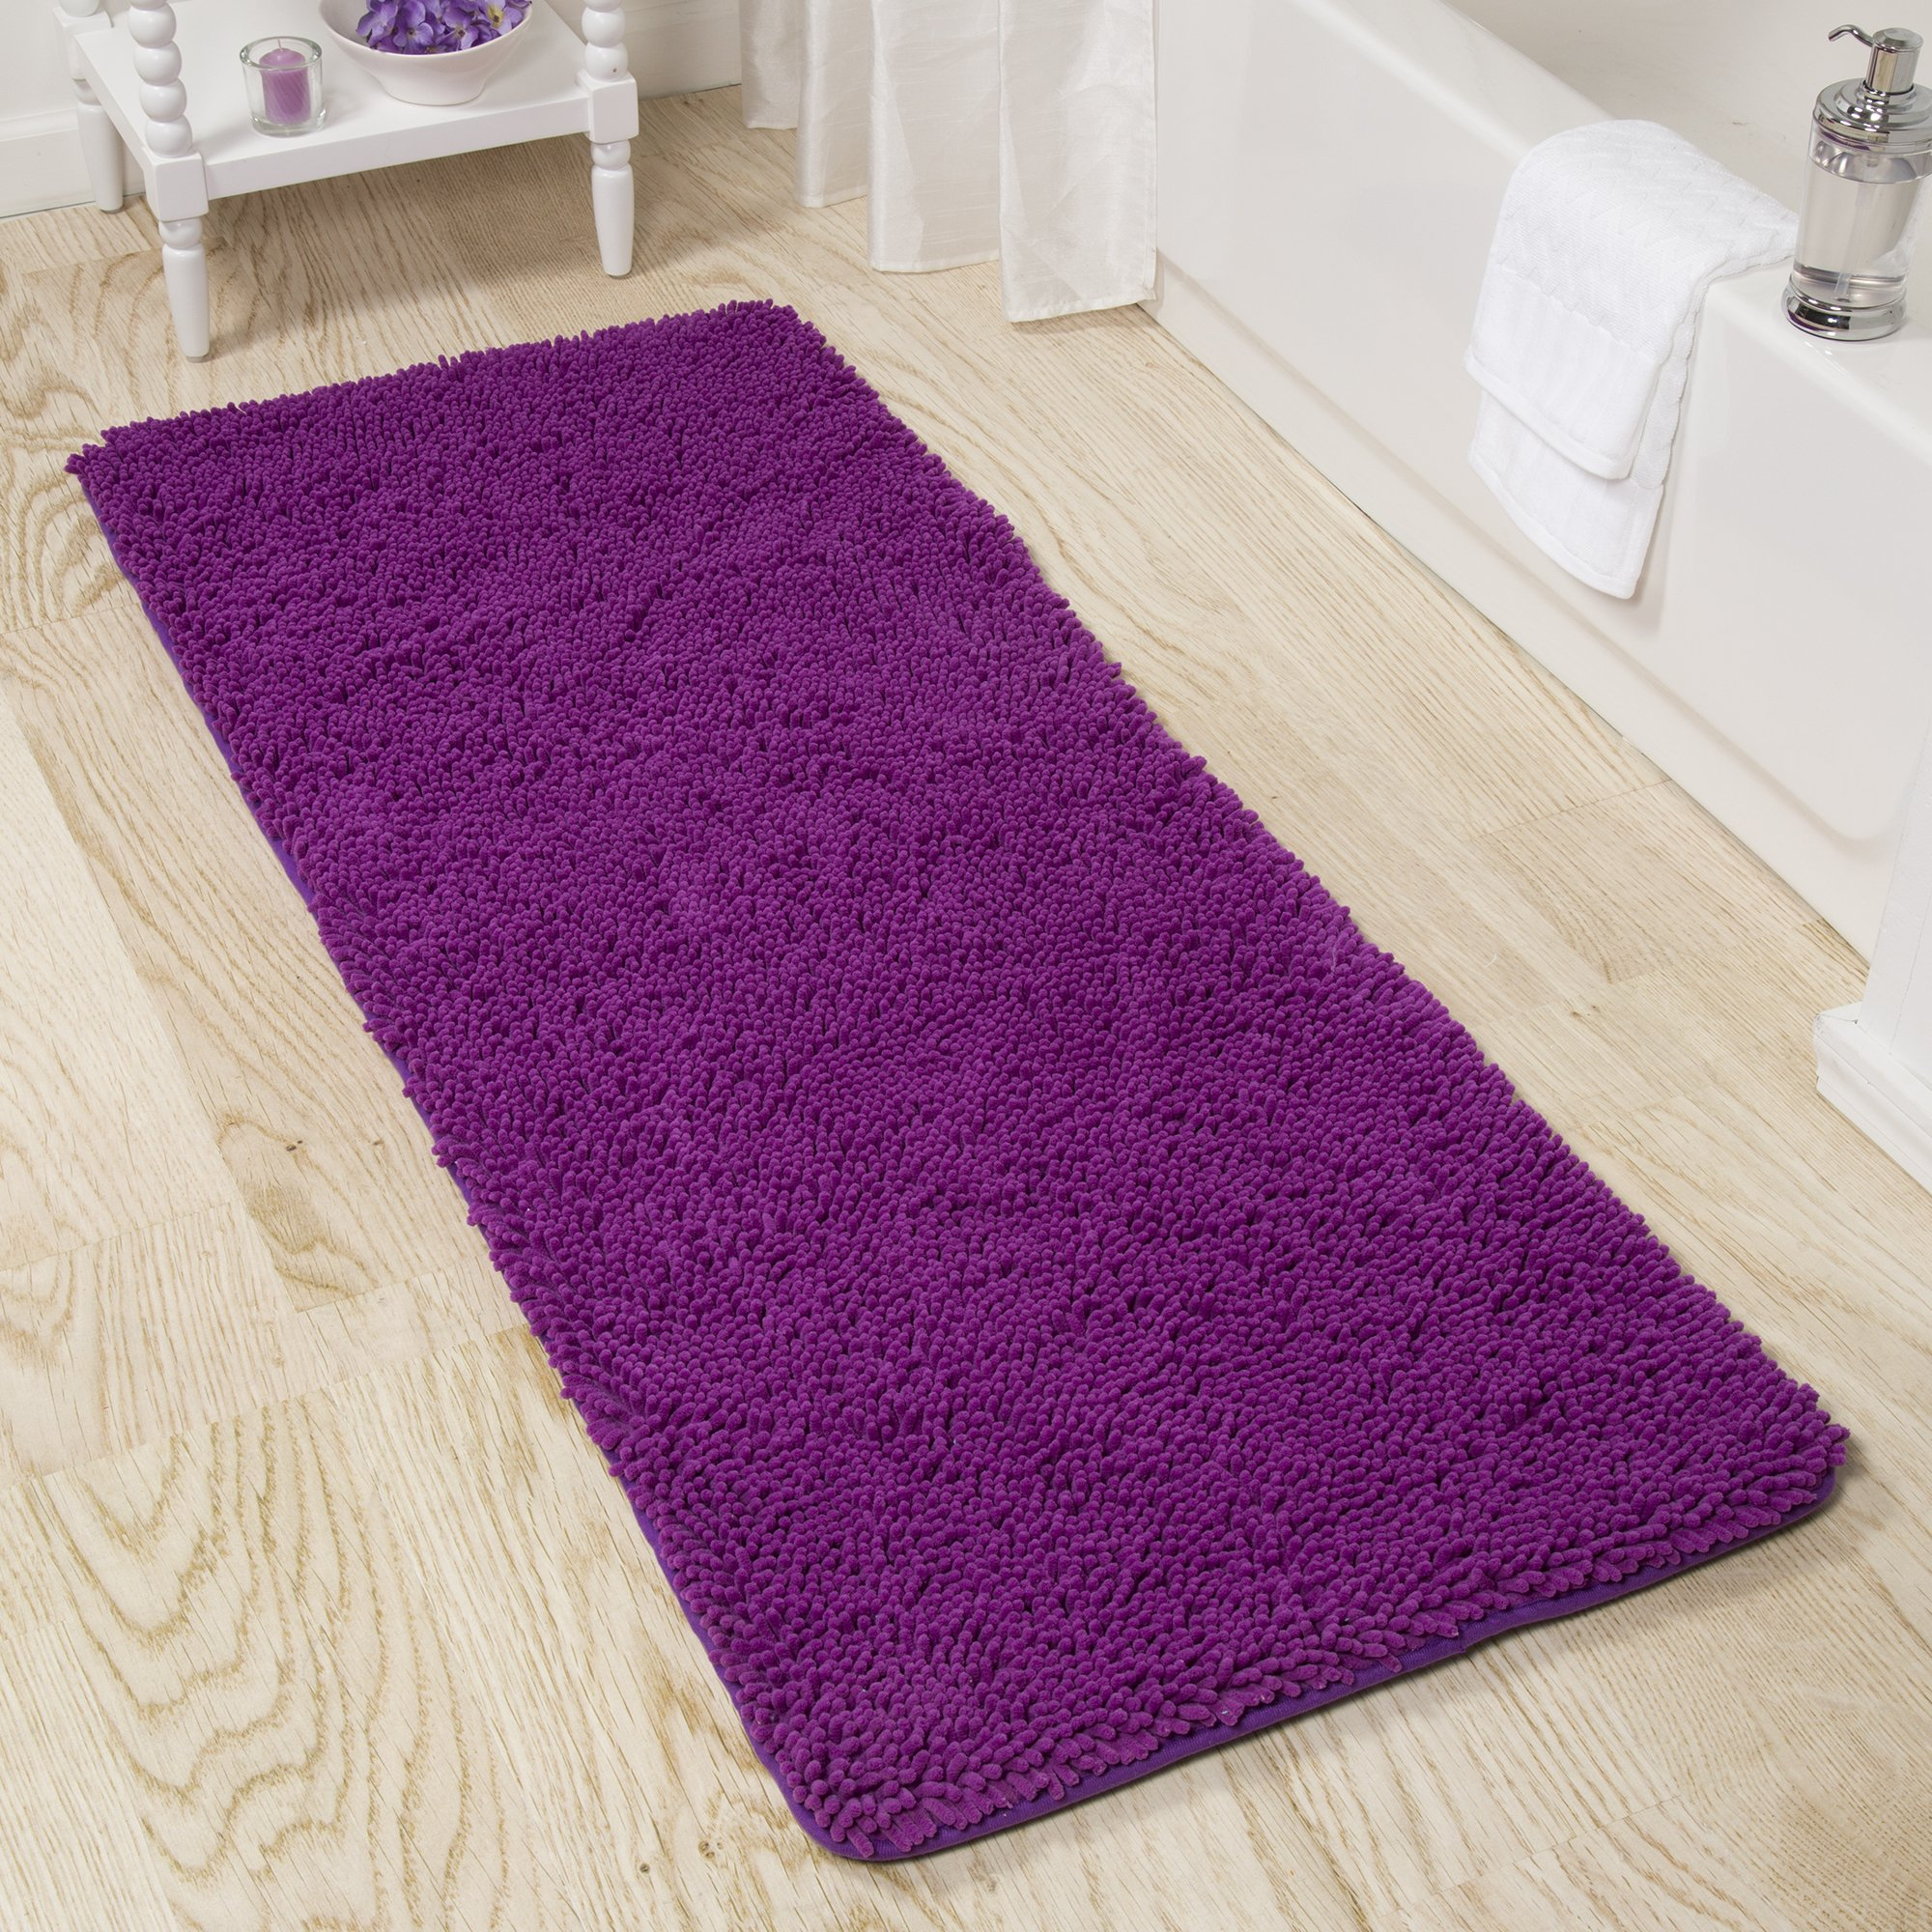 Bedford Home Memory Foam Shag Bath Mat 2-Feet by 5-Feet - Purple